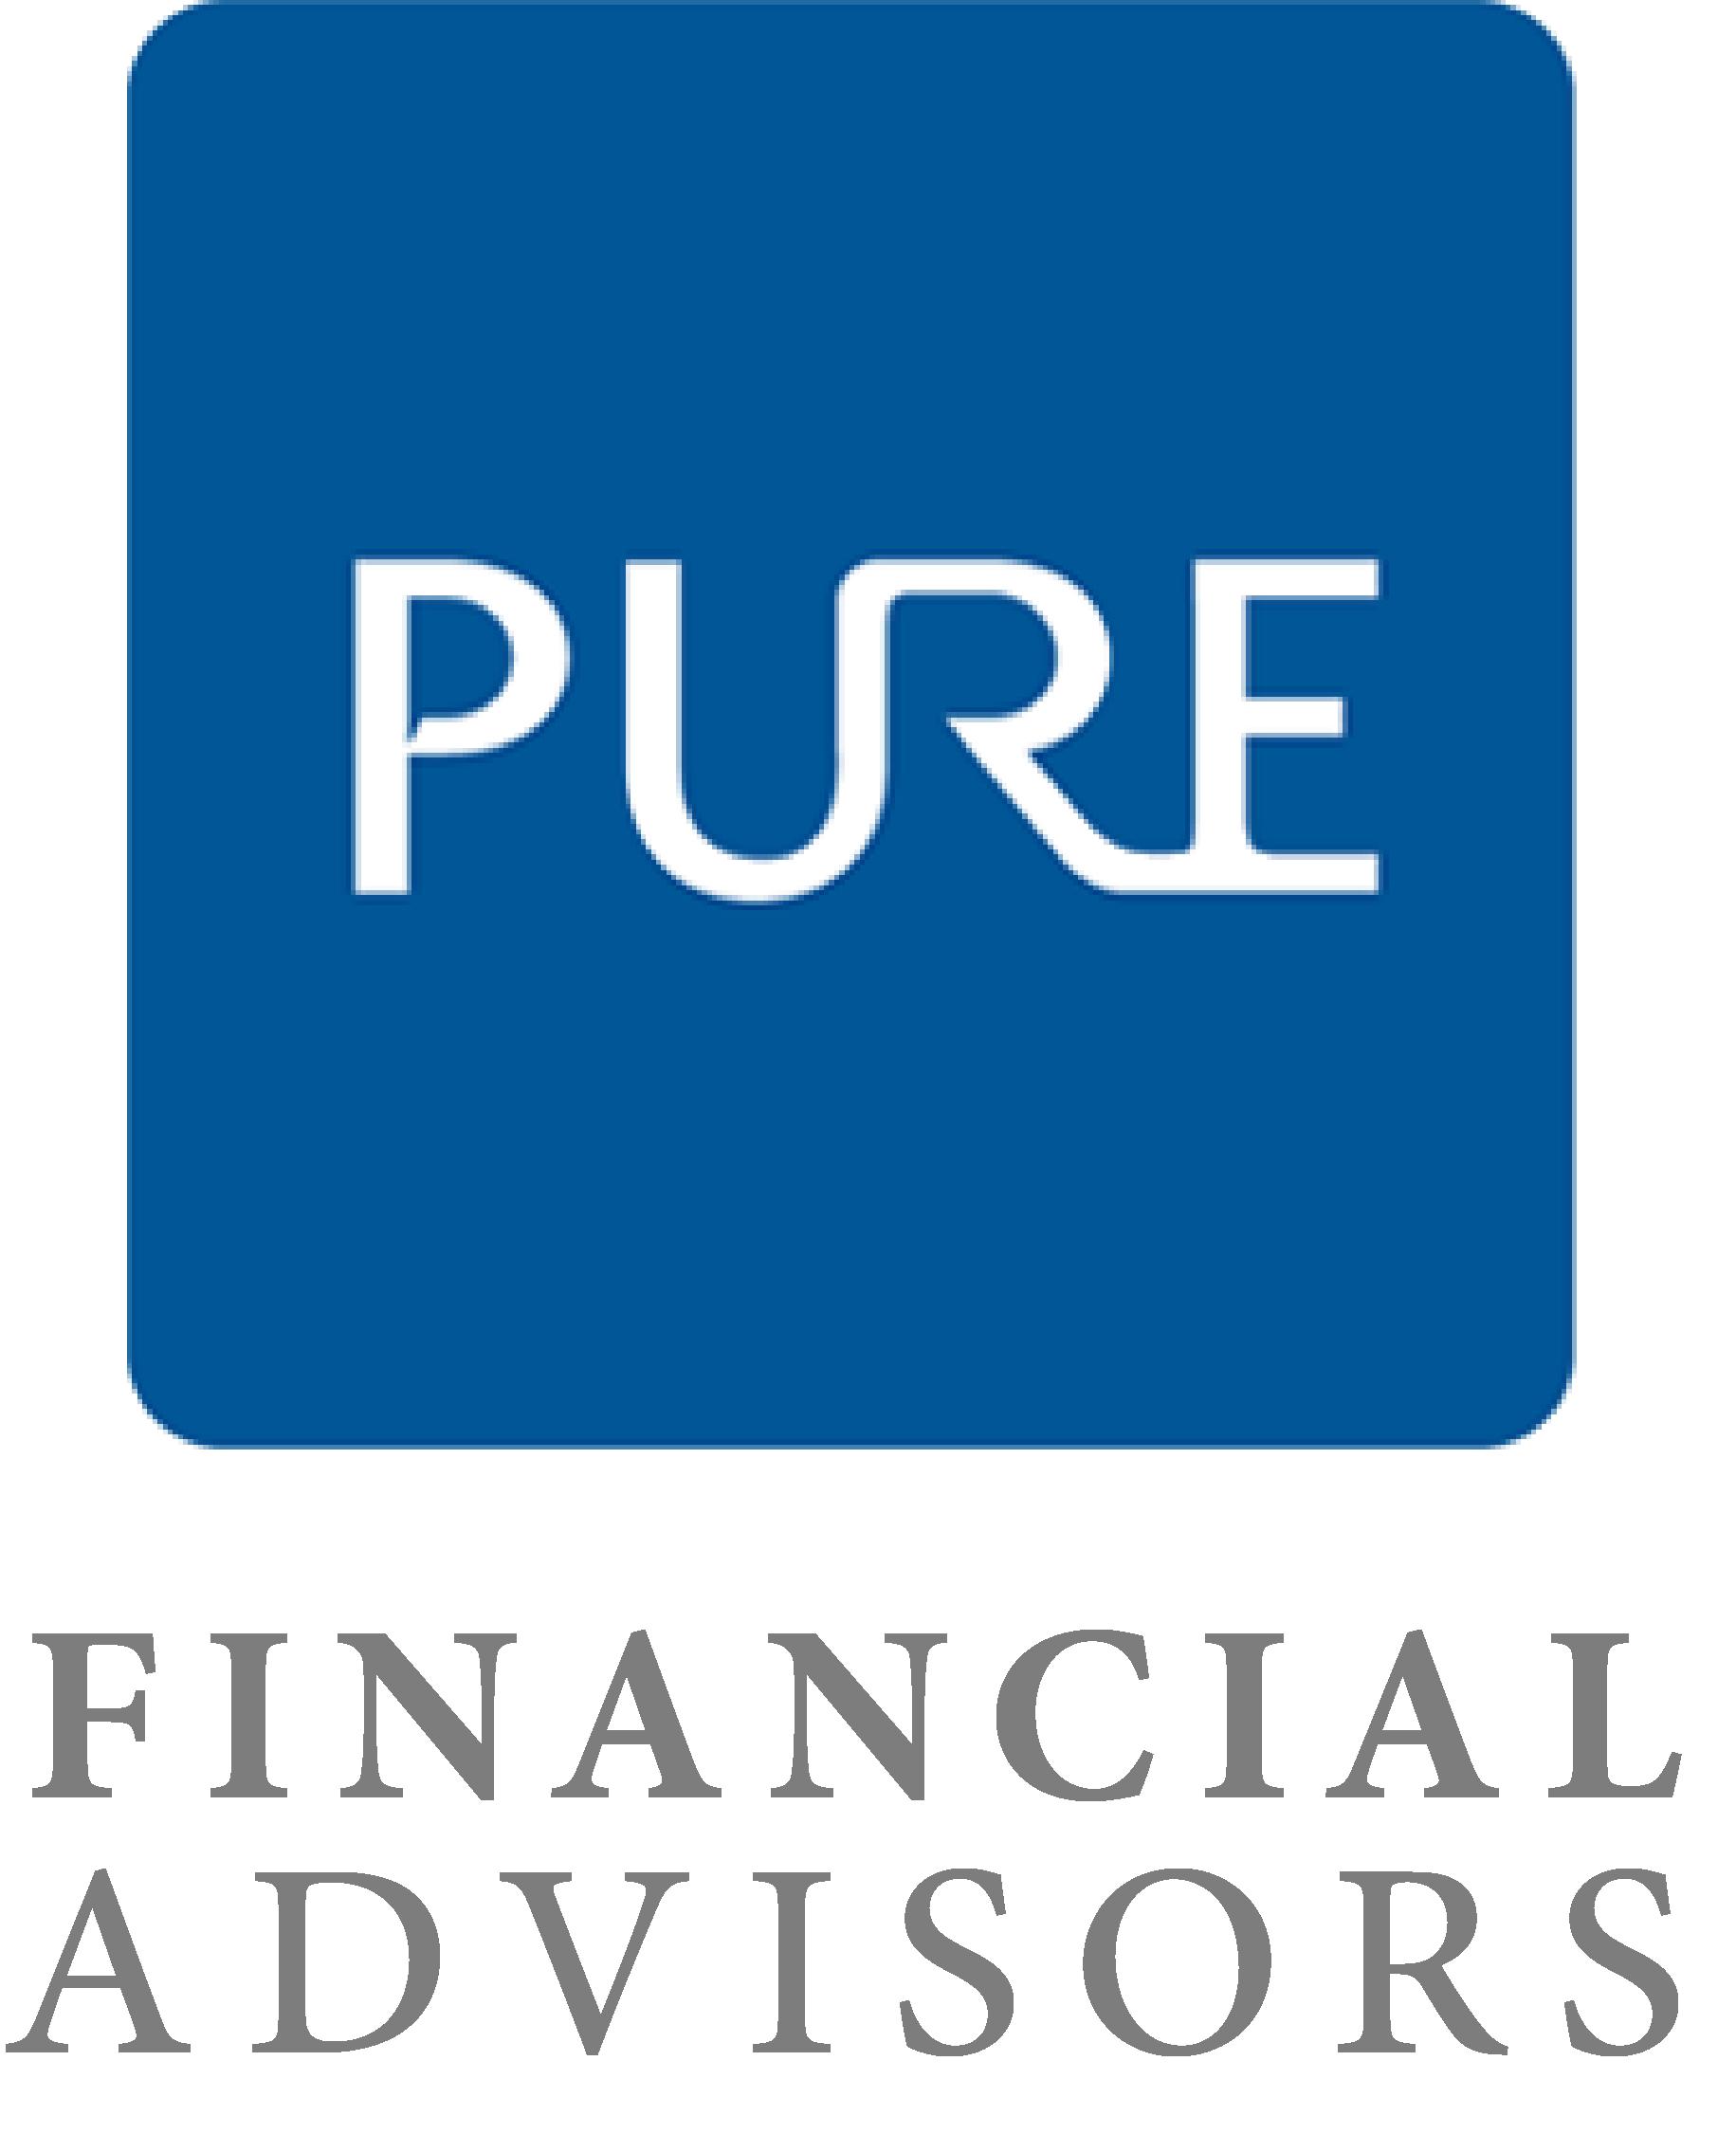 Pure Financial Advisors